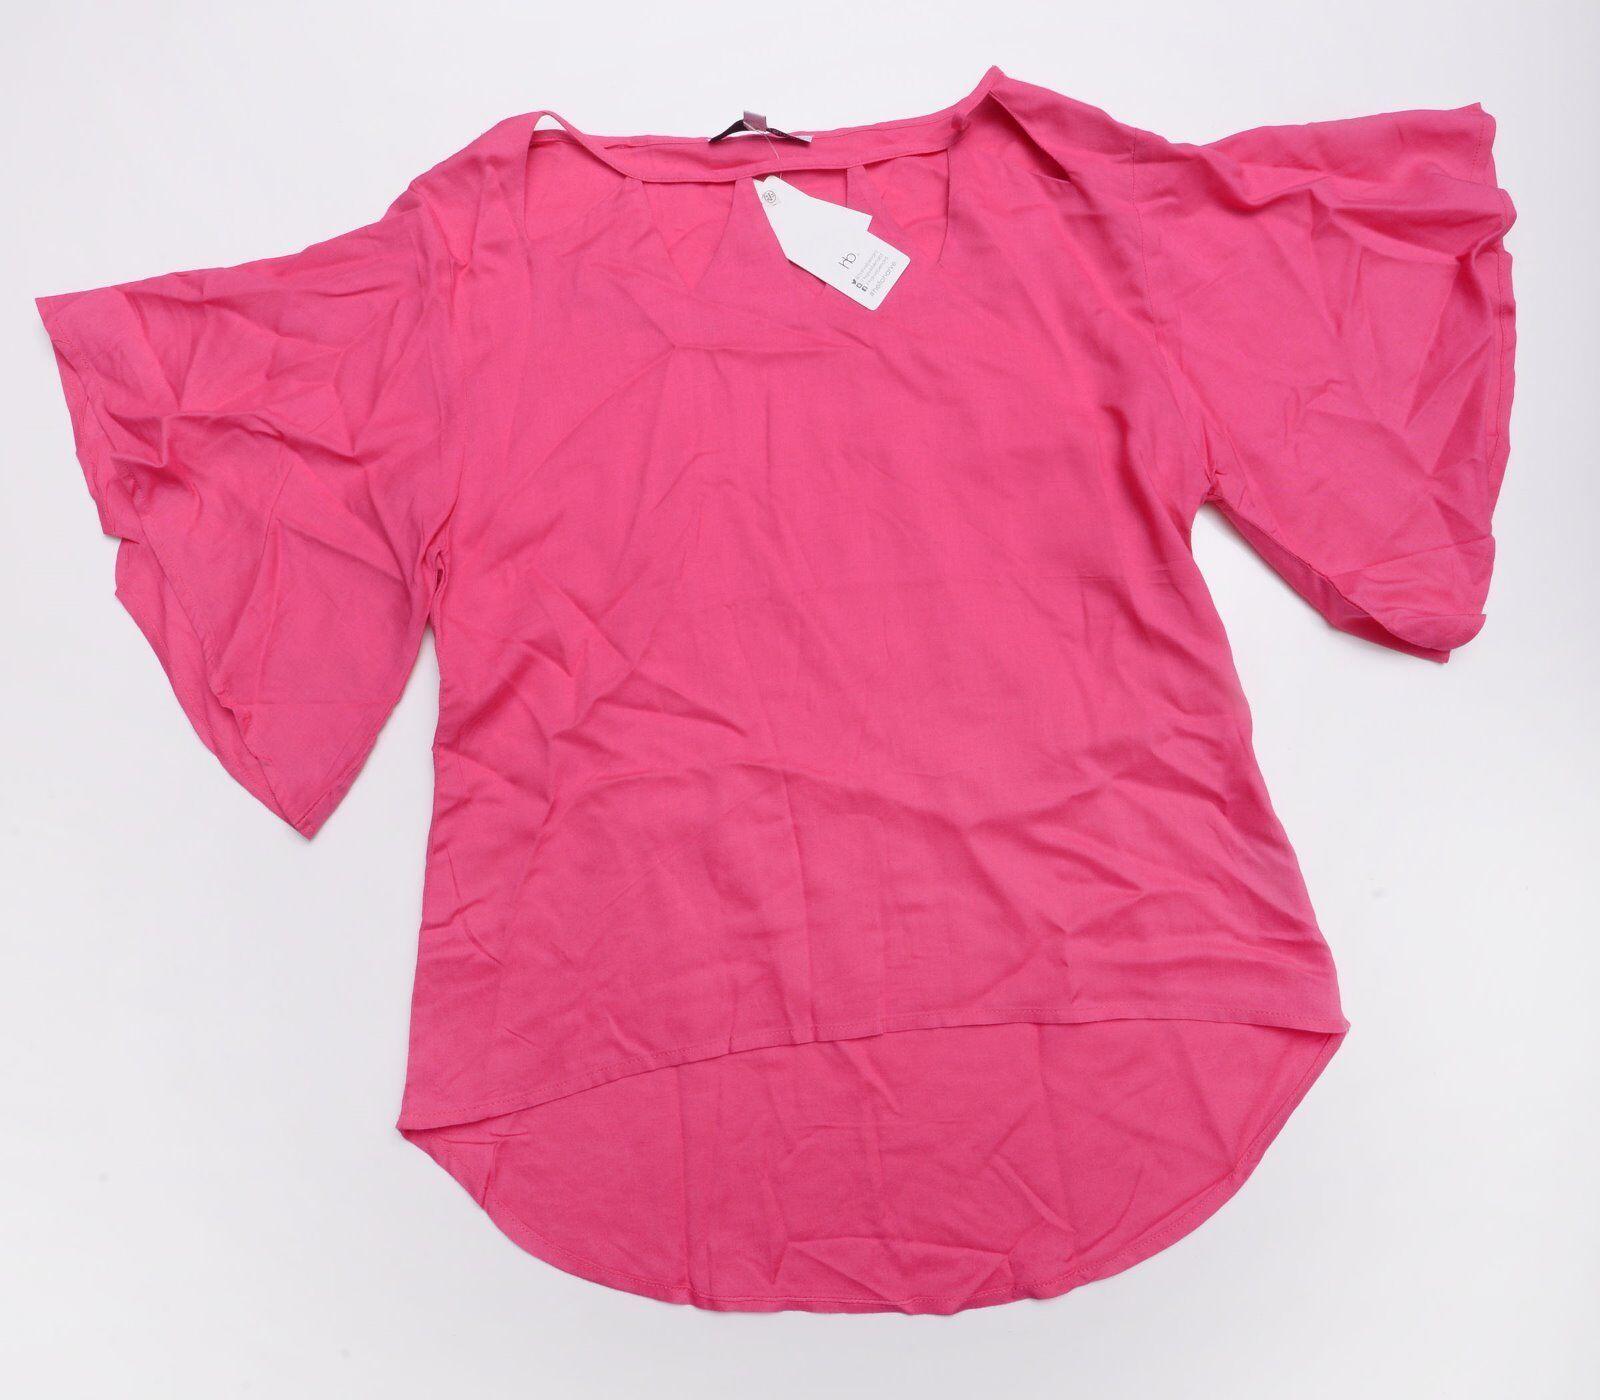 HARVE BENARD Womens BLOUSE SHIRT Size Small Pink NWT